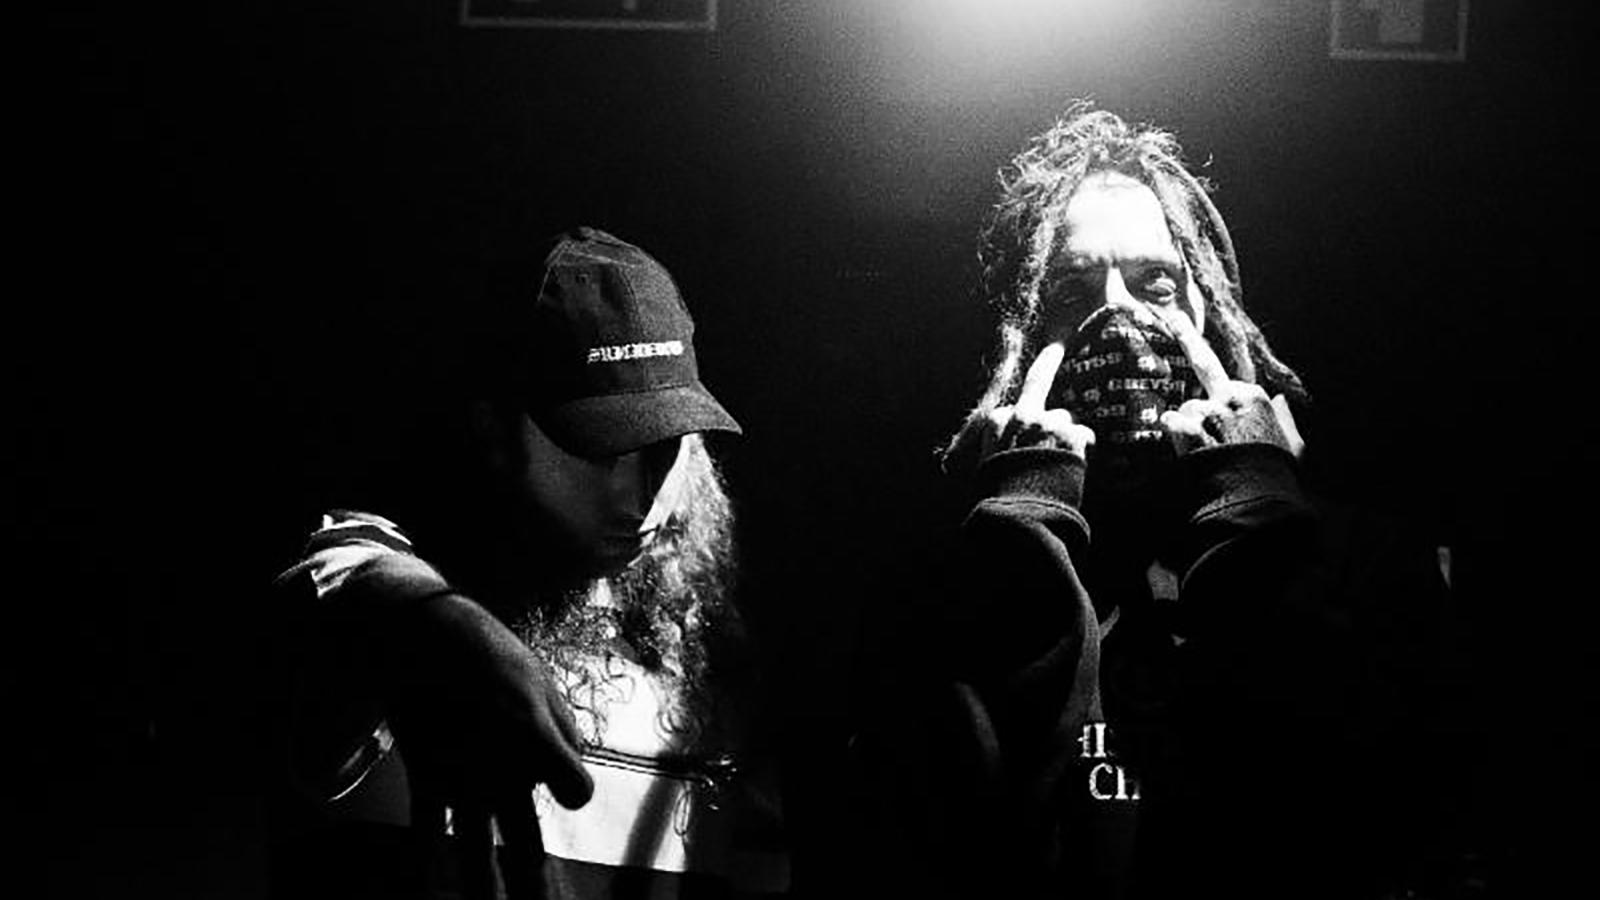 Hear Heavy New Uicideboy X Travis Barker Ep Featuring Korn S